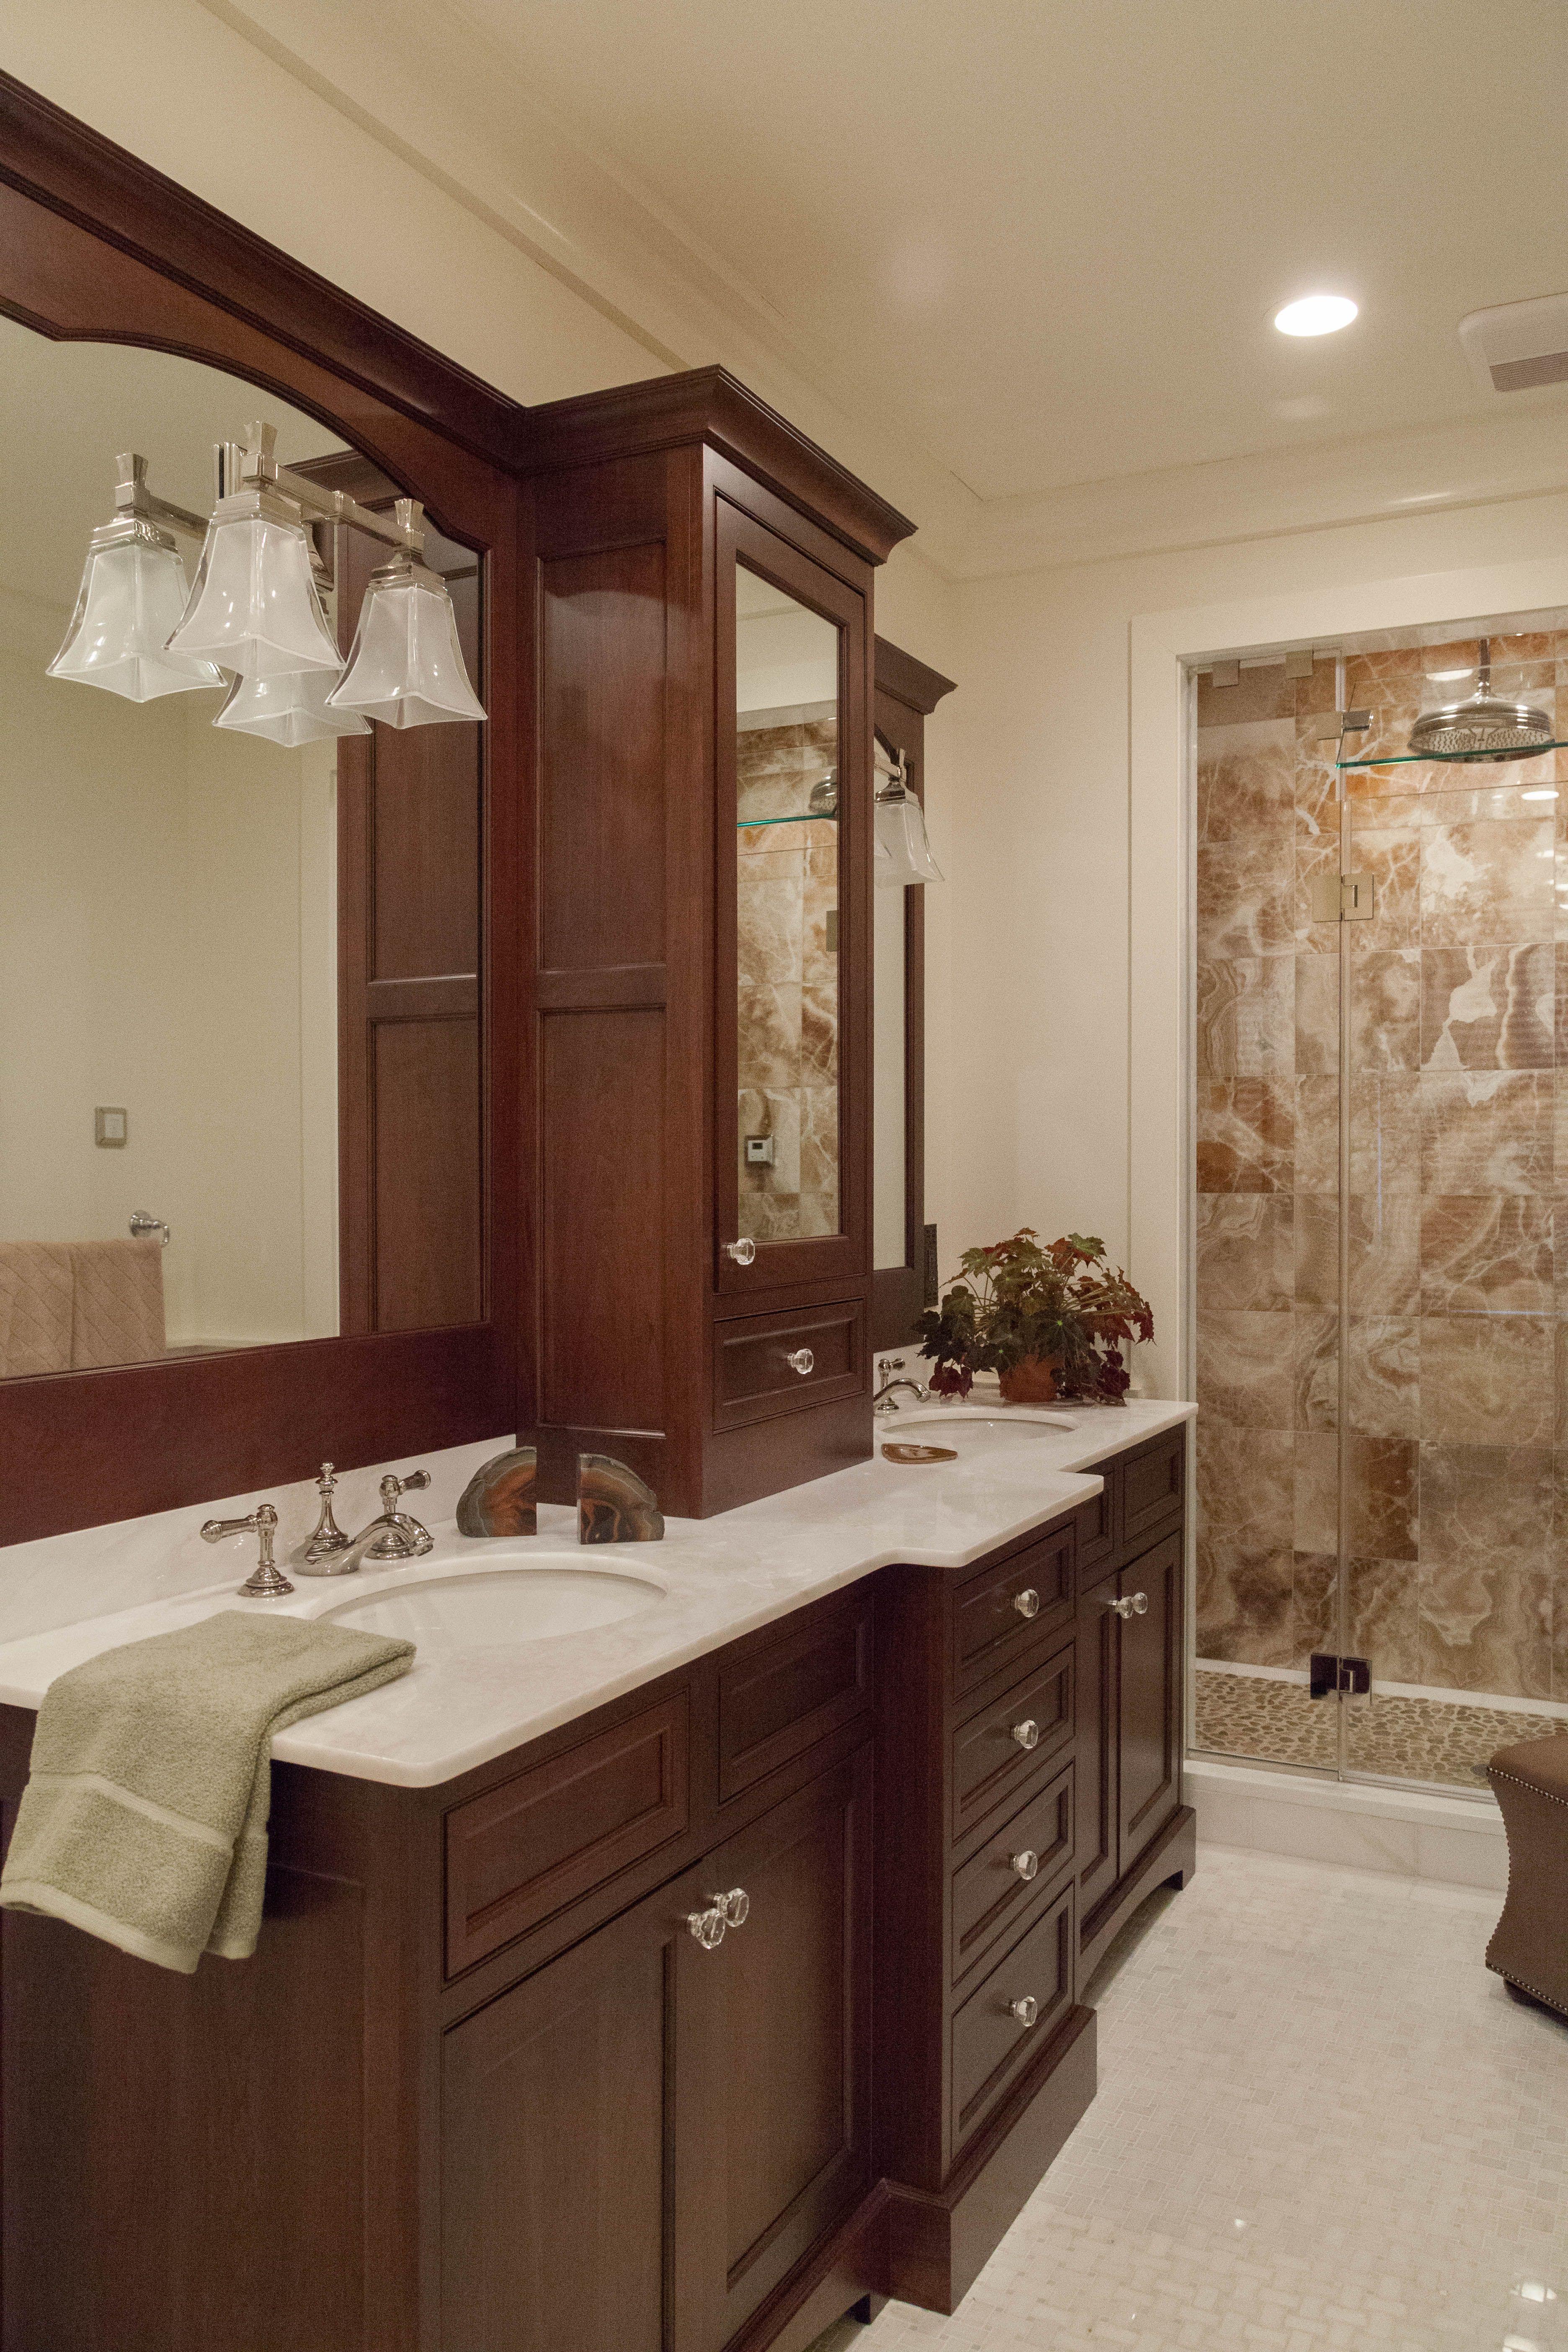 Lakeville designer Kathleen Fredrich designed a bathroom that